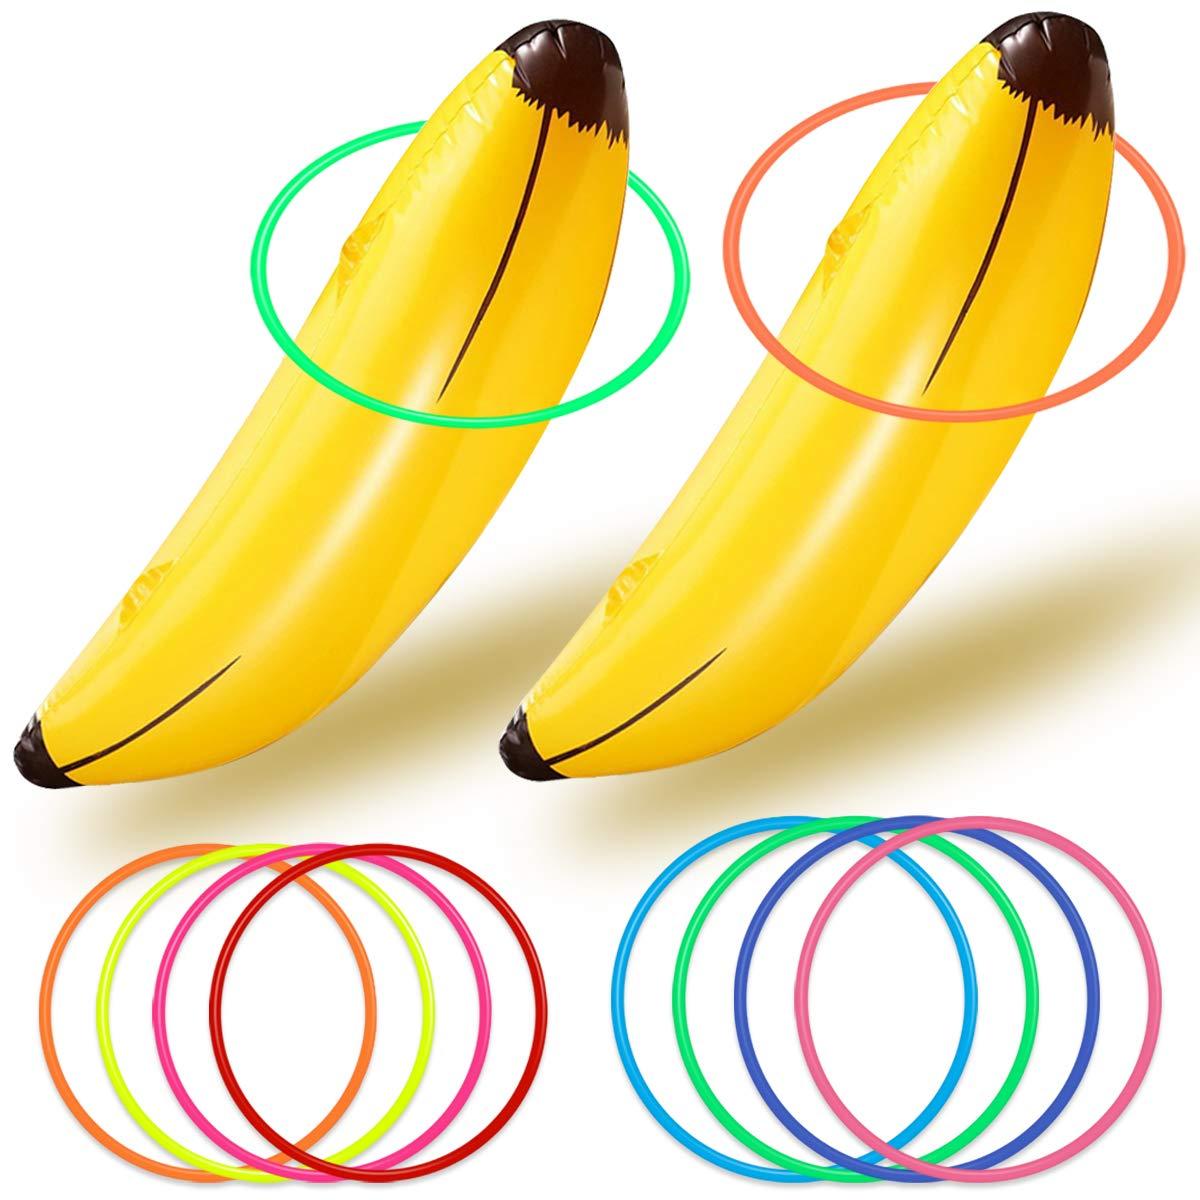 Bachelorette Juego de Fiesta Inflable Banana Ring Toss ...